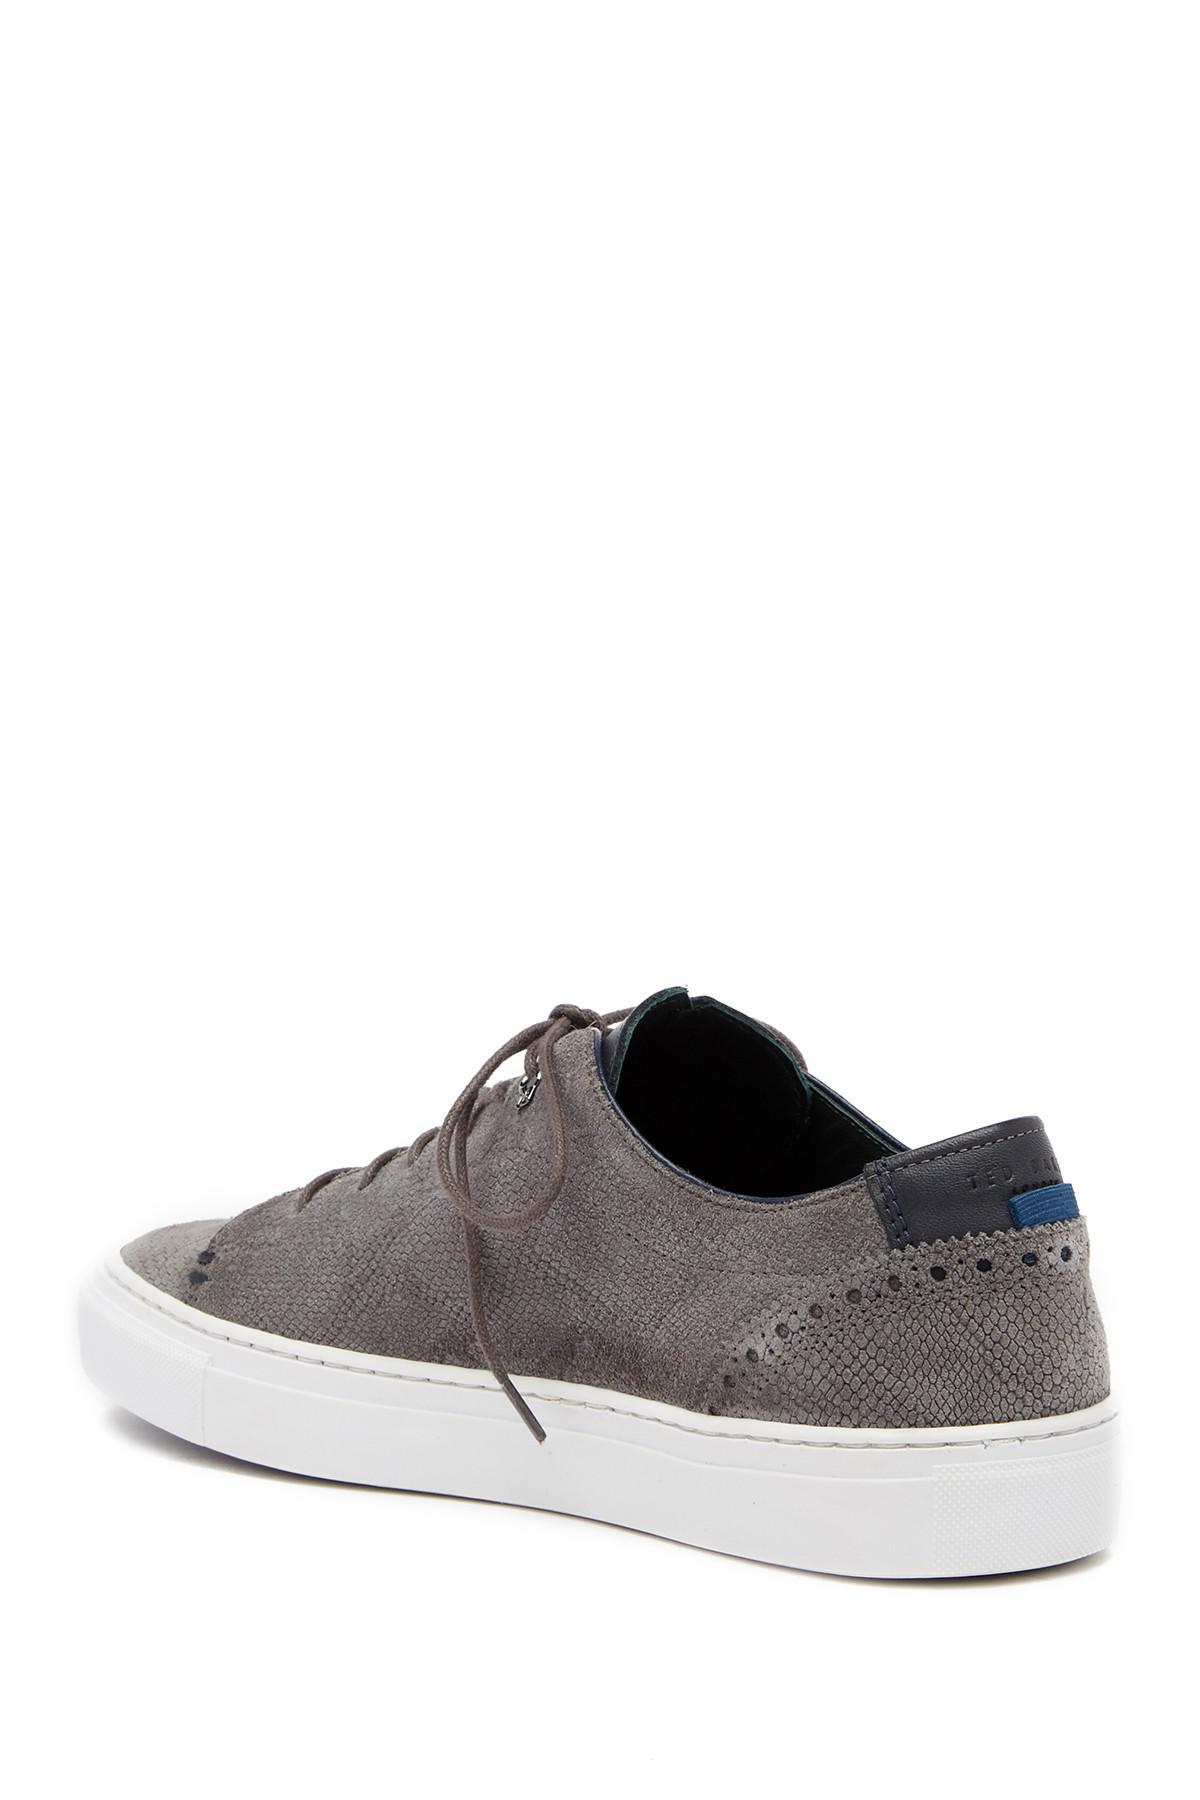 71512dd1e Ted Baker - Gray Duuke Suede Sneaker for Men - Lyst. View fullscreen